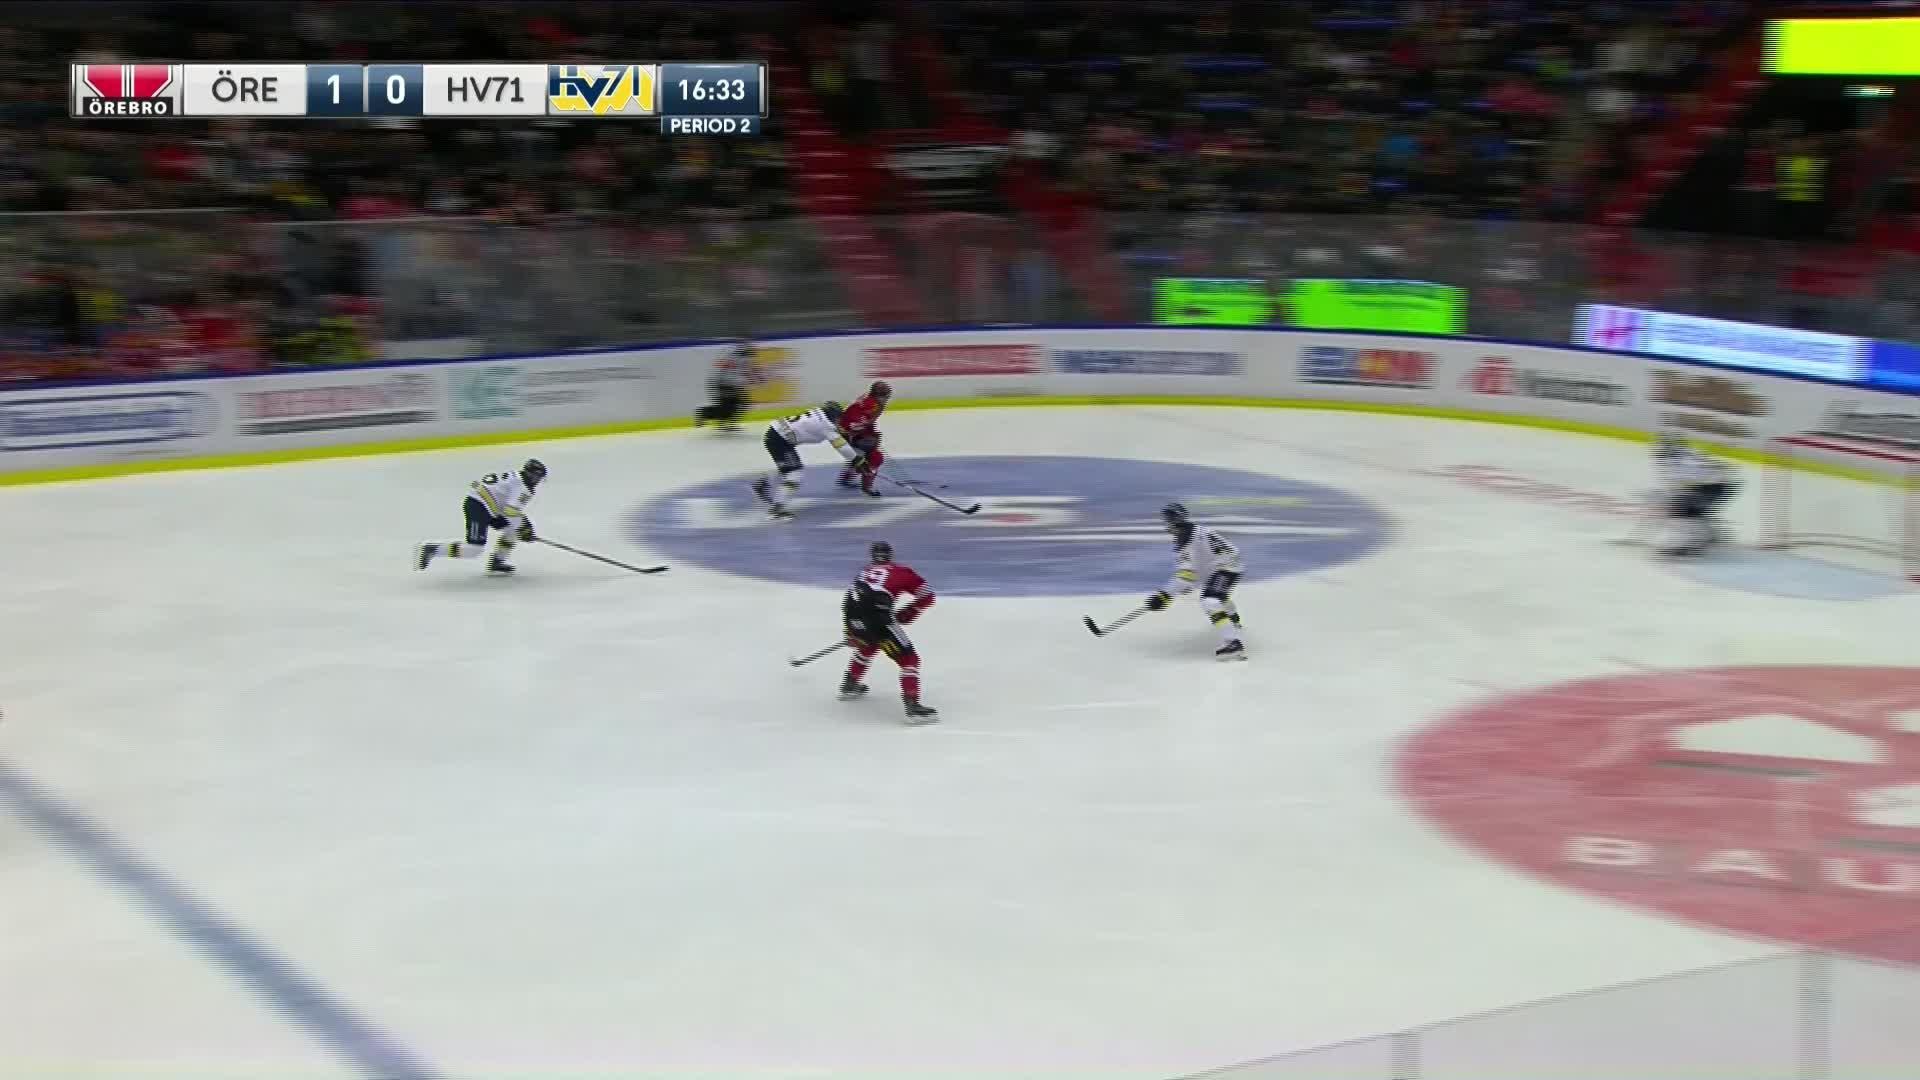 Örebro Hockey - HV71 2-0